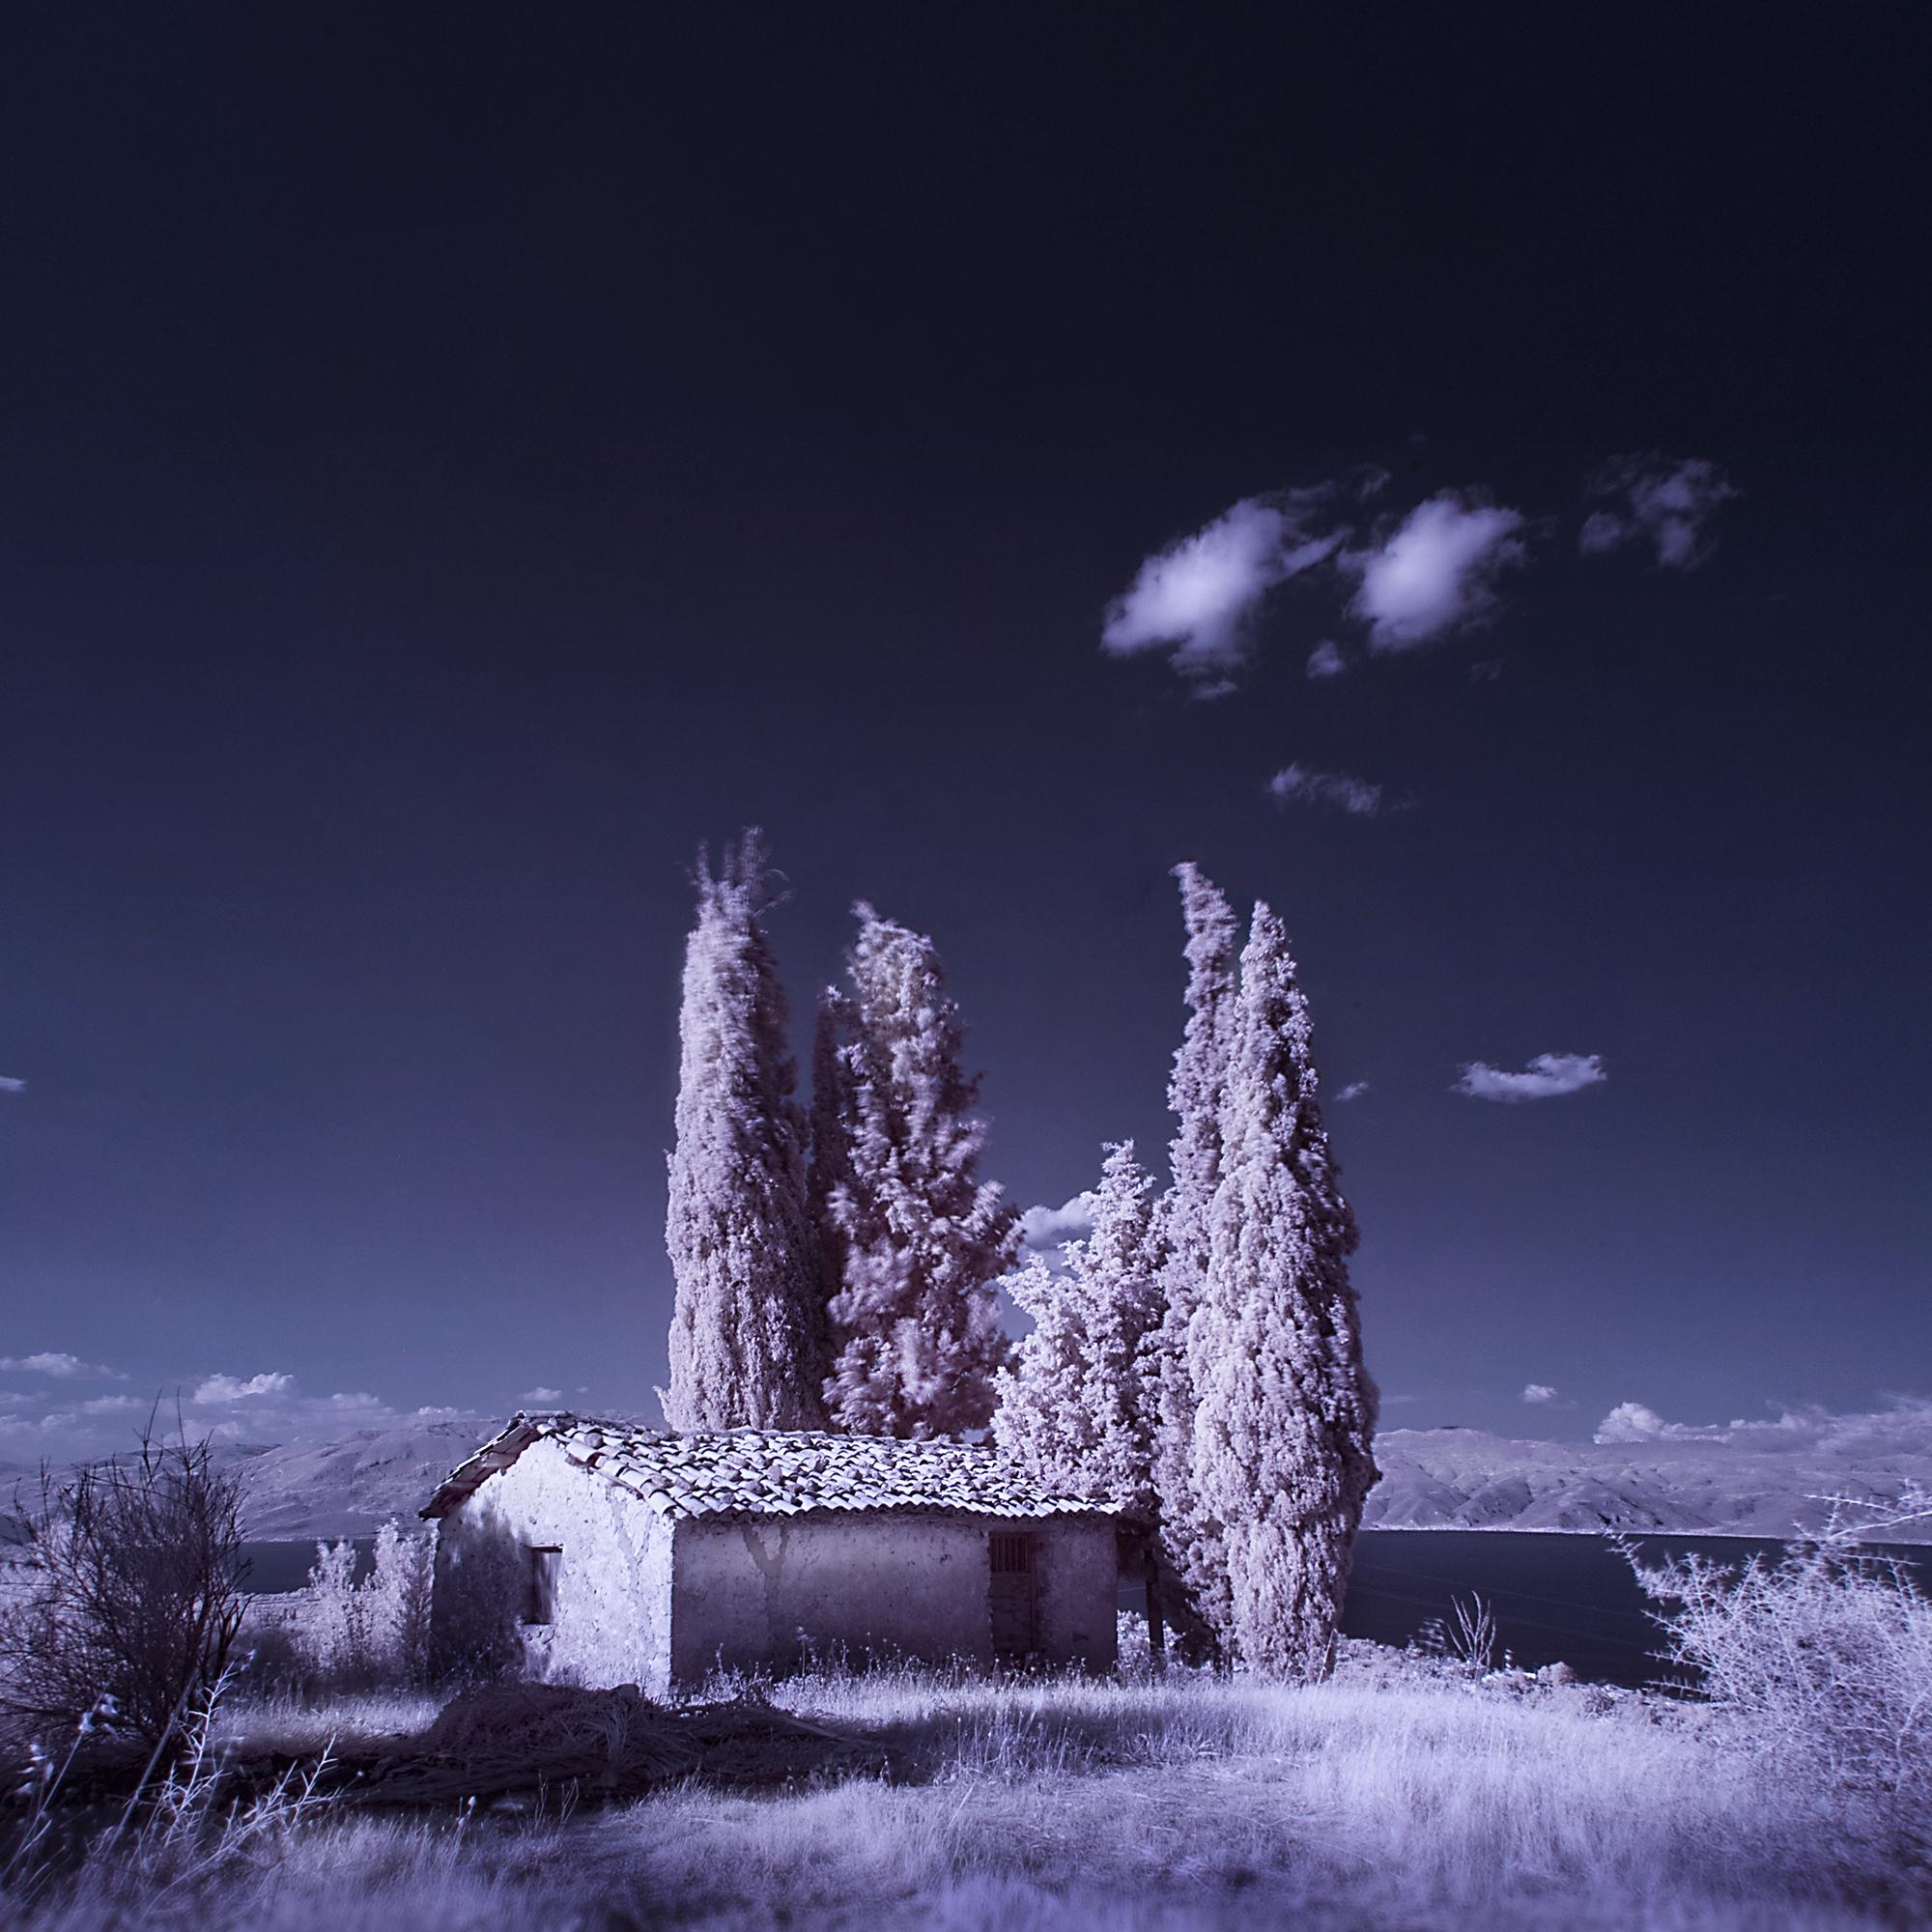 Infra4 cypress hut